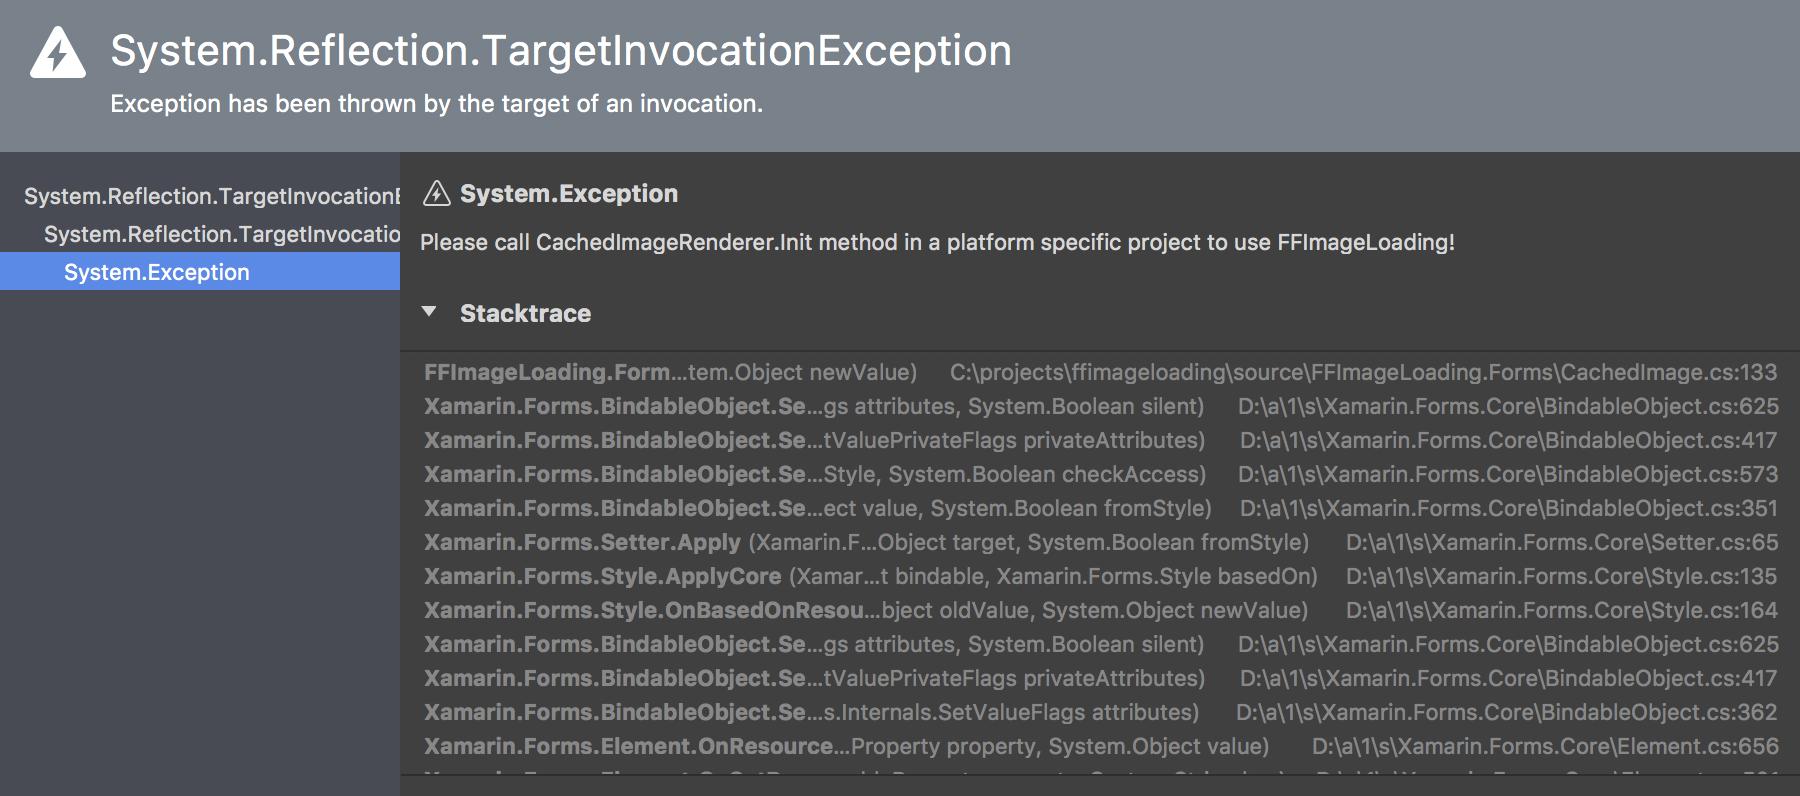 CachedImageRenderer Init error Xamarin Forms Droid v3